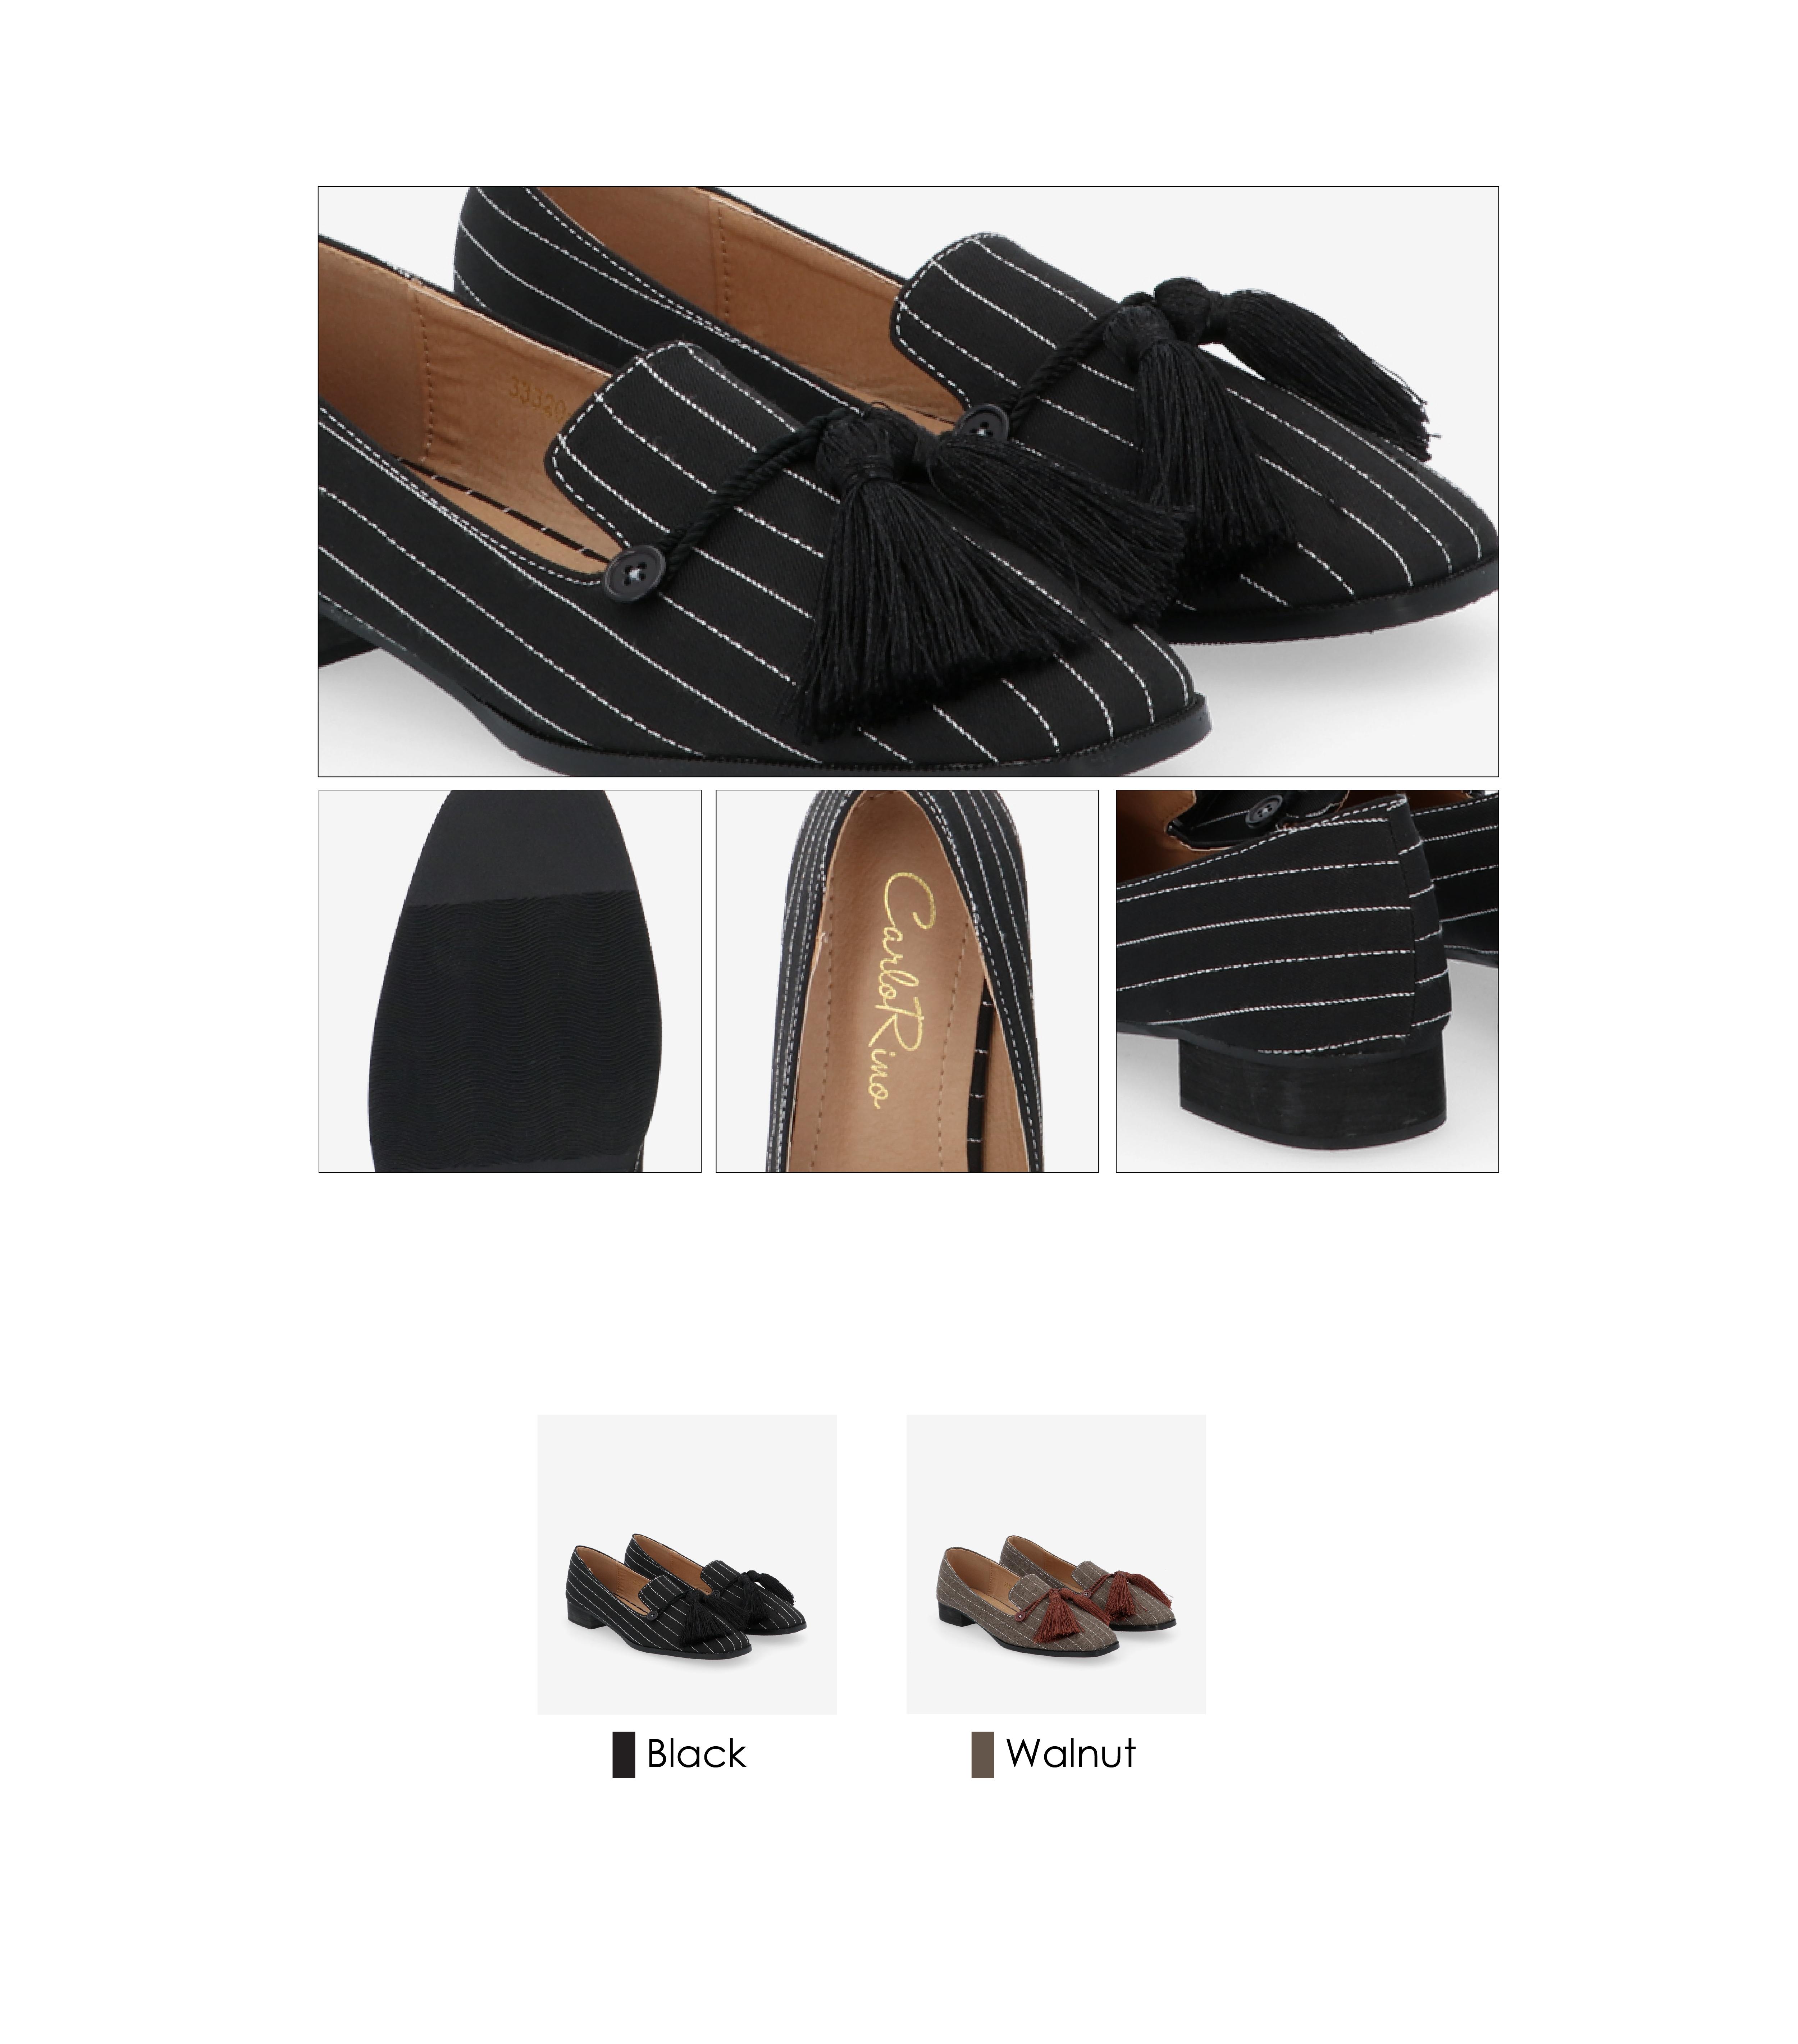 "33320 J001 03 - 1"" Suri In Stripes Loafers"